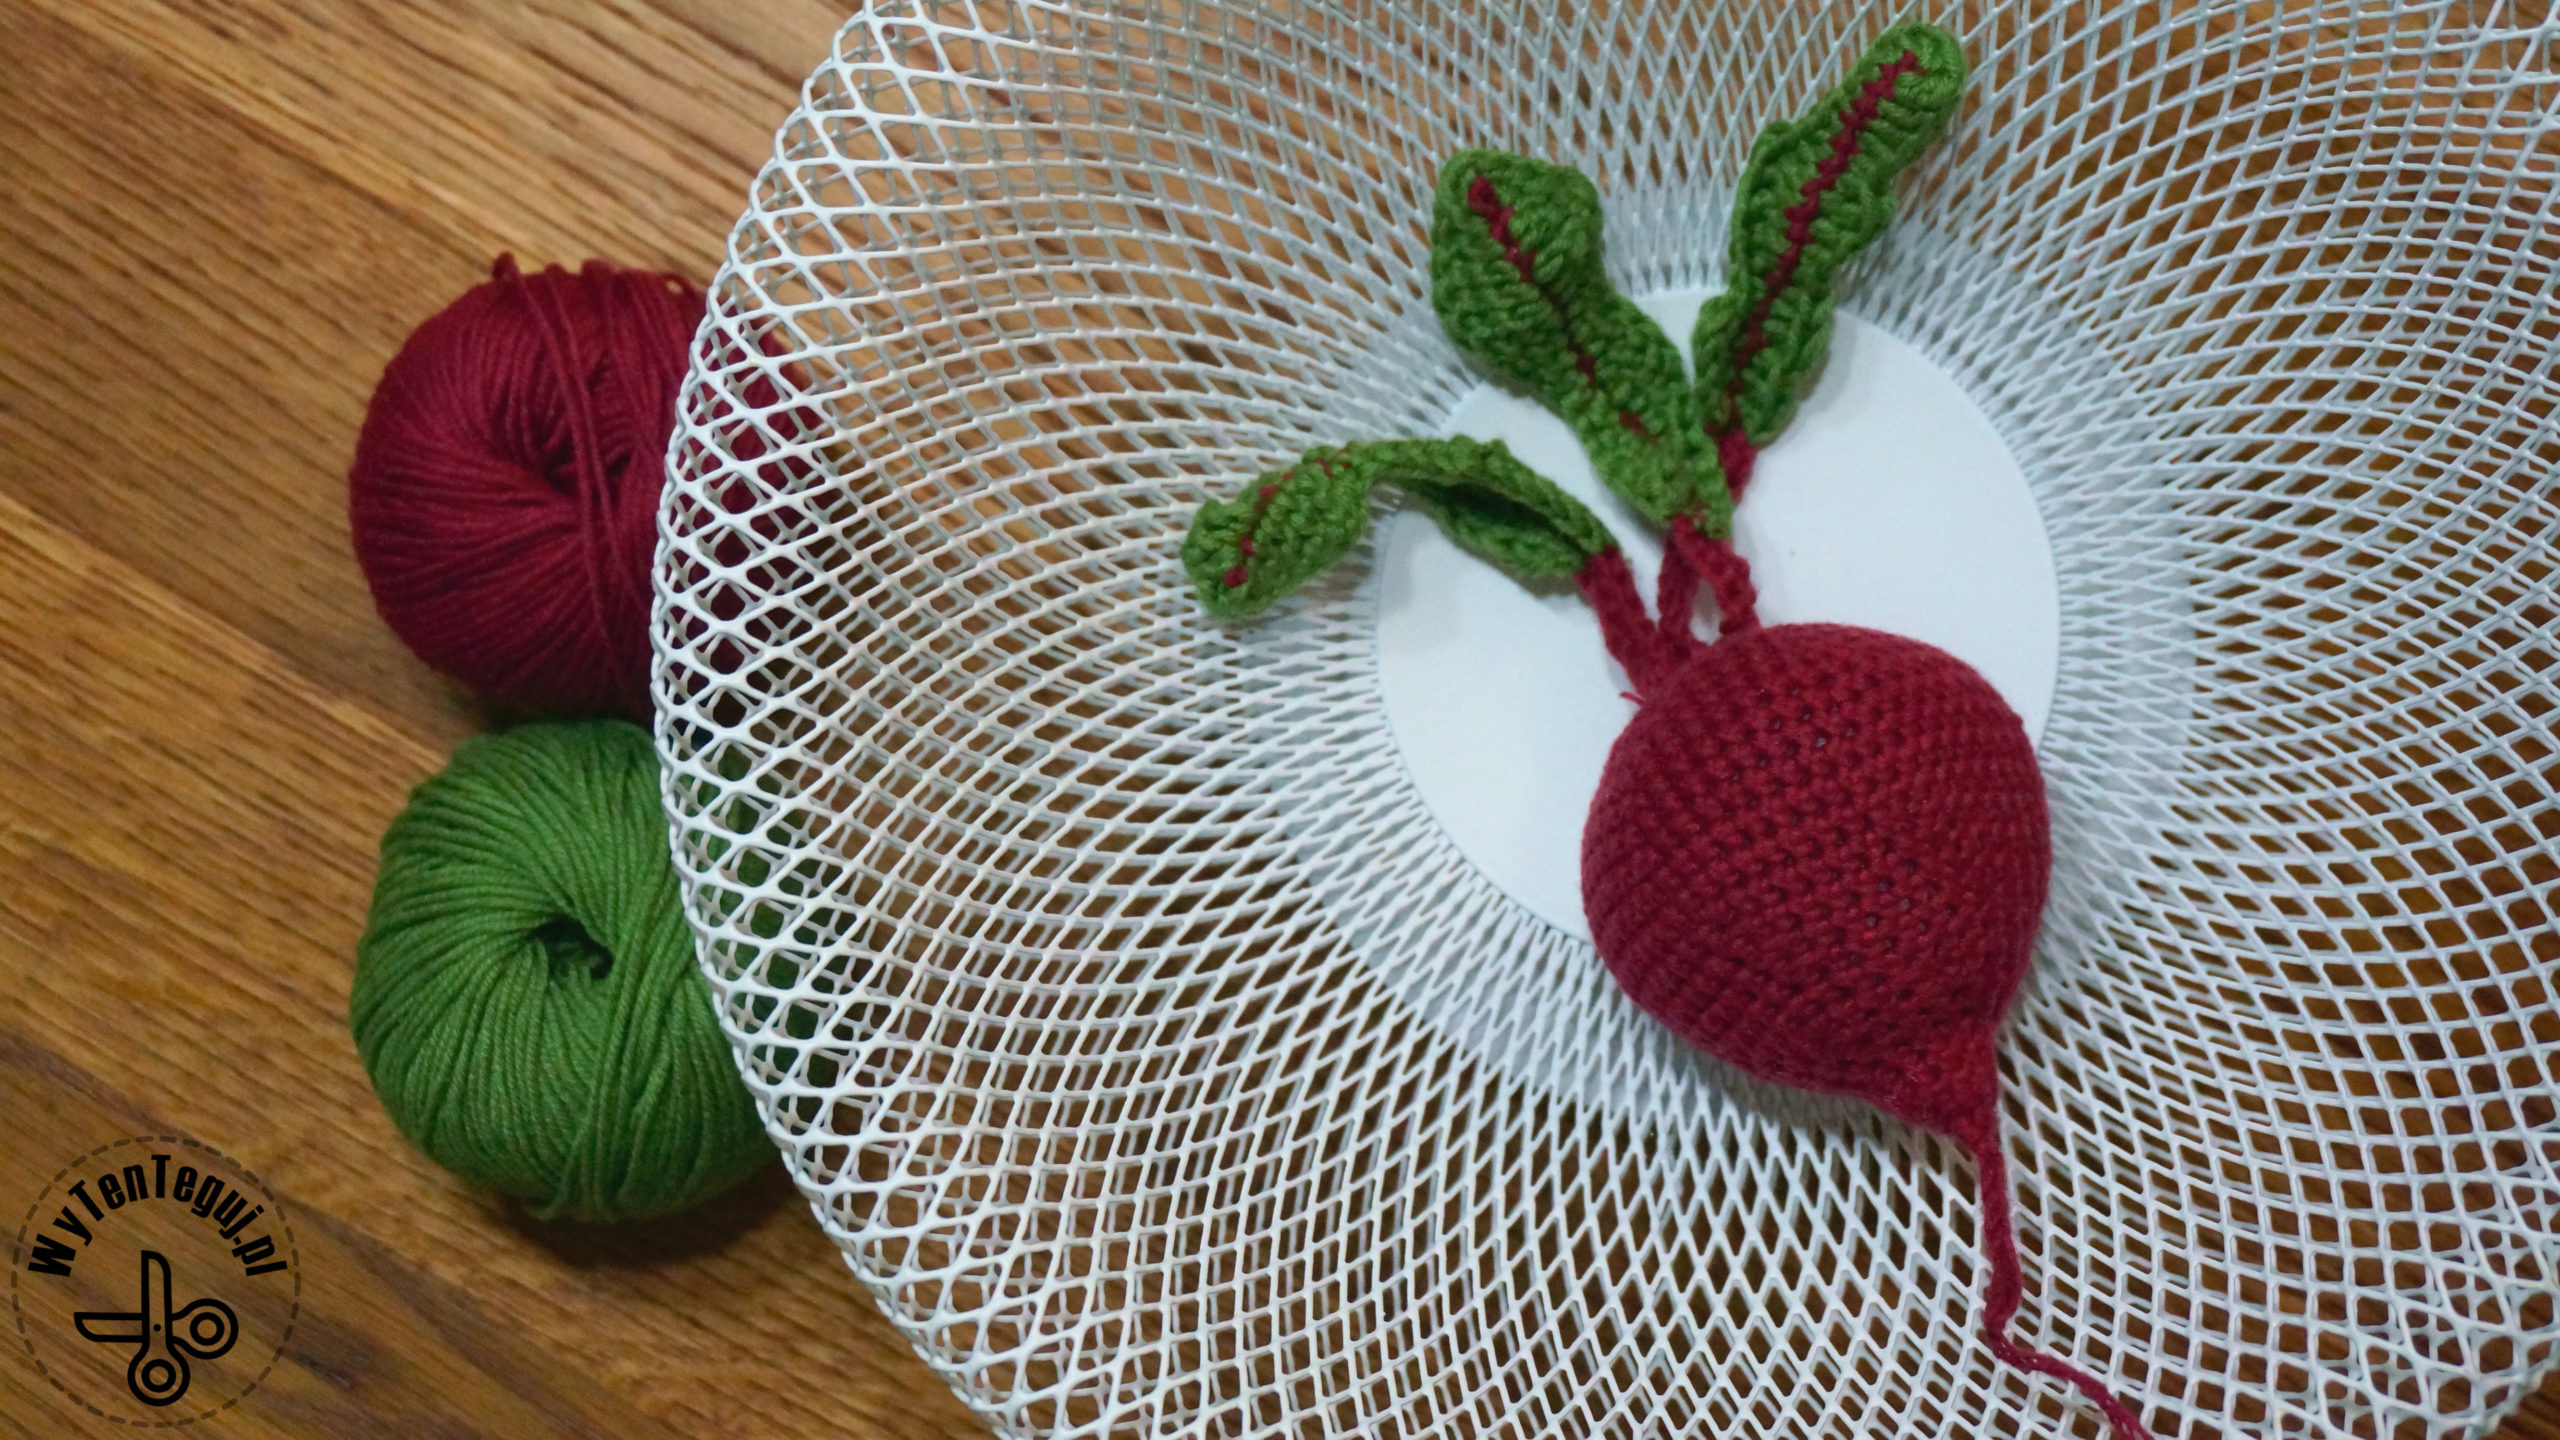 Ravelry: 35 Crochet Play Food Fruits & Vegetables pattern by Veronica Kay  Crochet   1440x2560